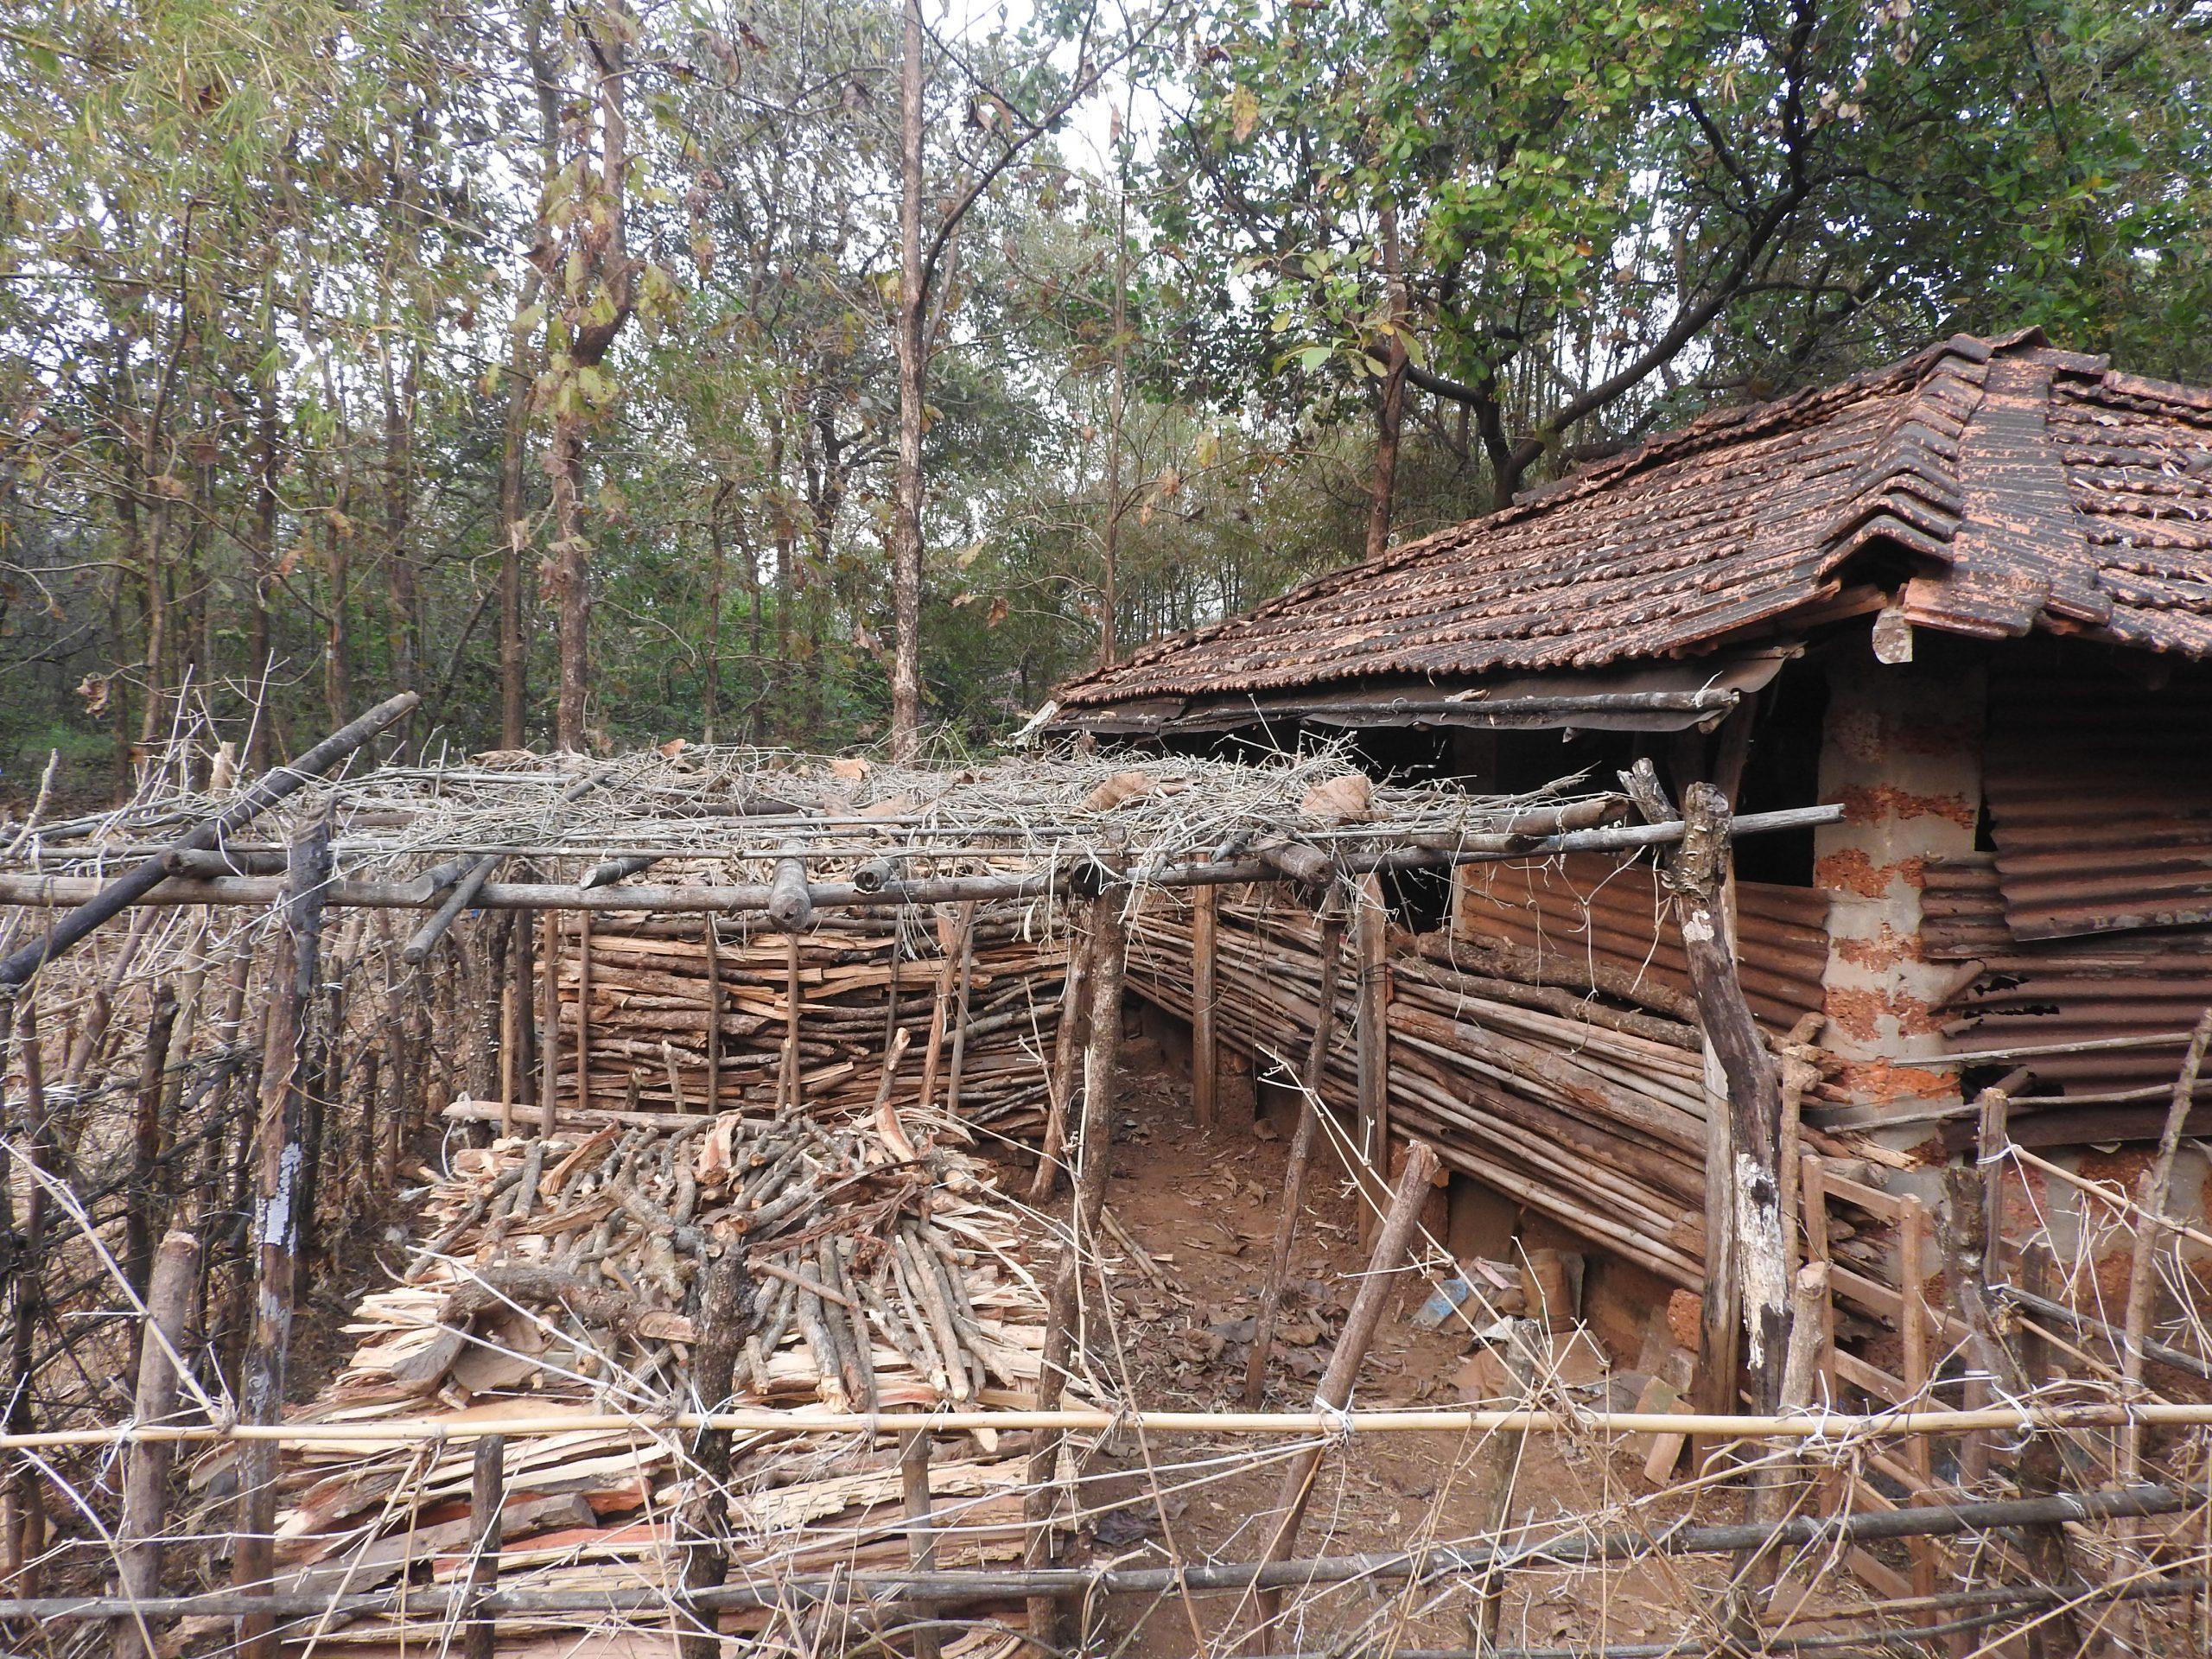 Wood shack and hut